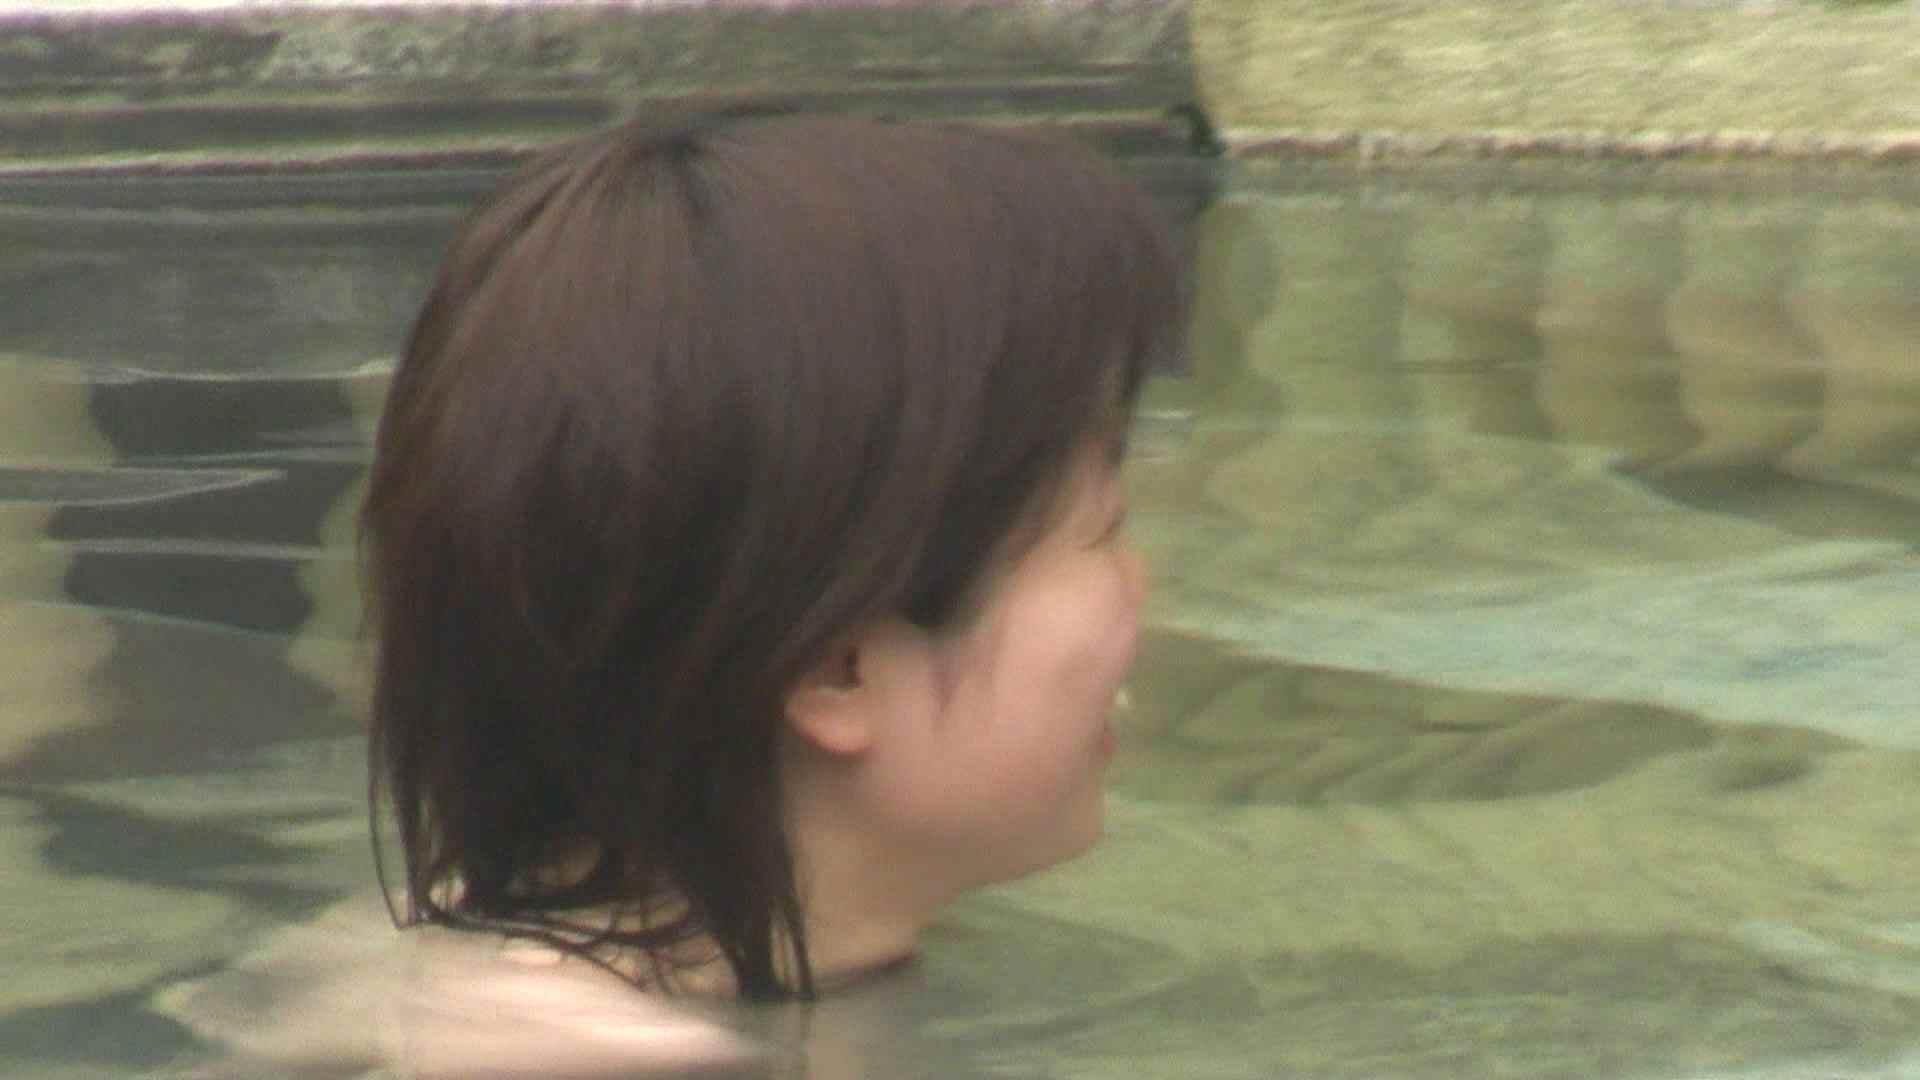 Aquaな露天風呂Vol.675 盗撮 | OLセックス  77画像 31